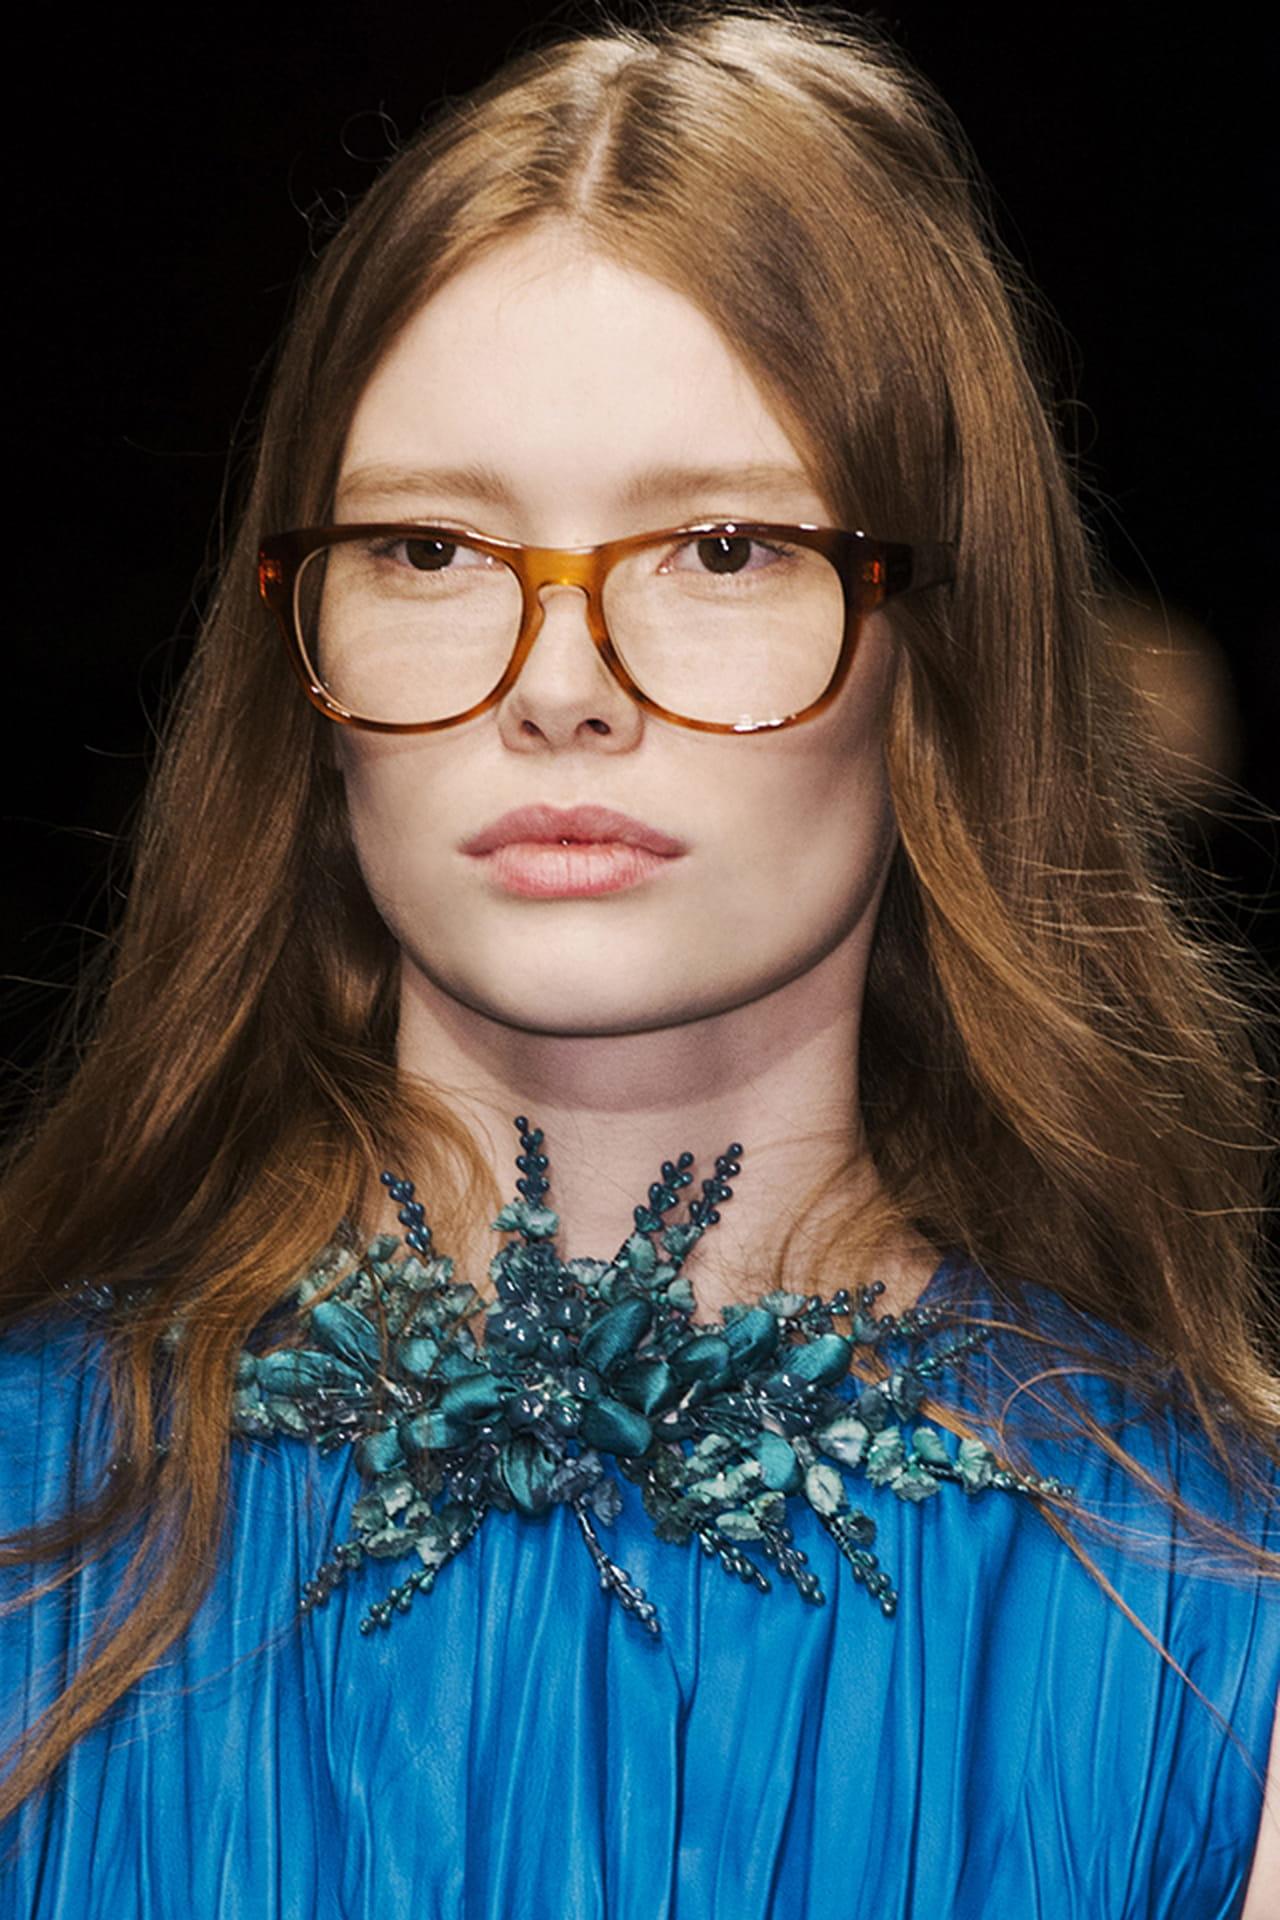 Descubra o modelo de óculos de grau ideal para seu tipo de rosto 072422e154